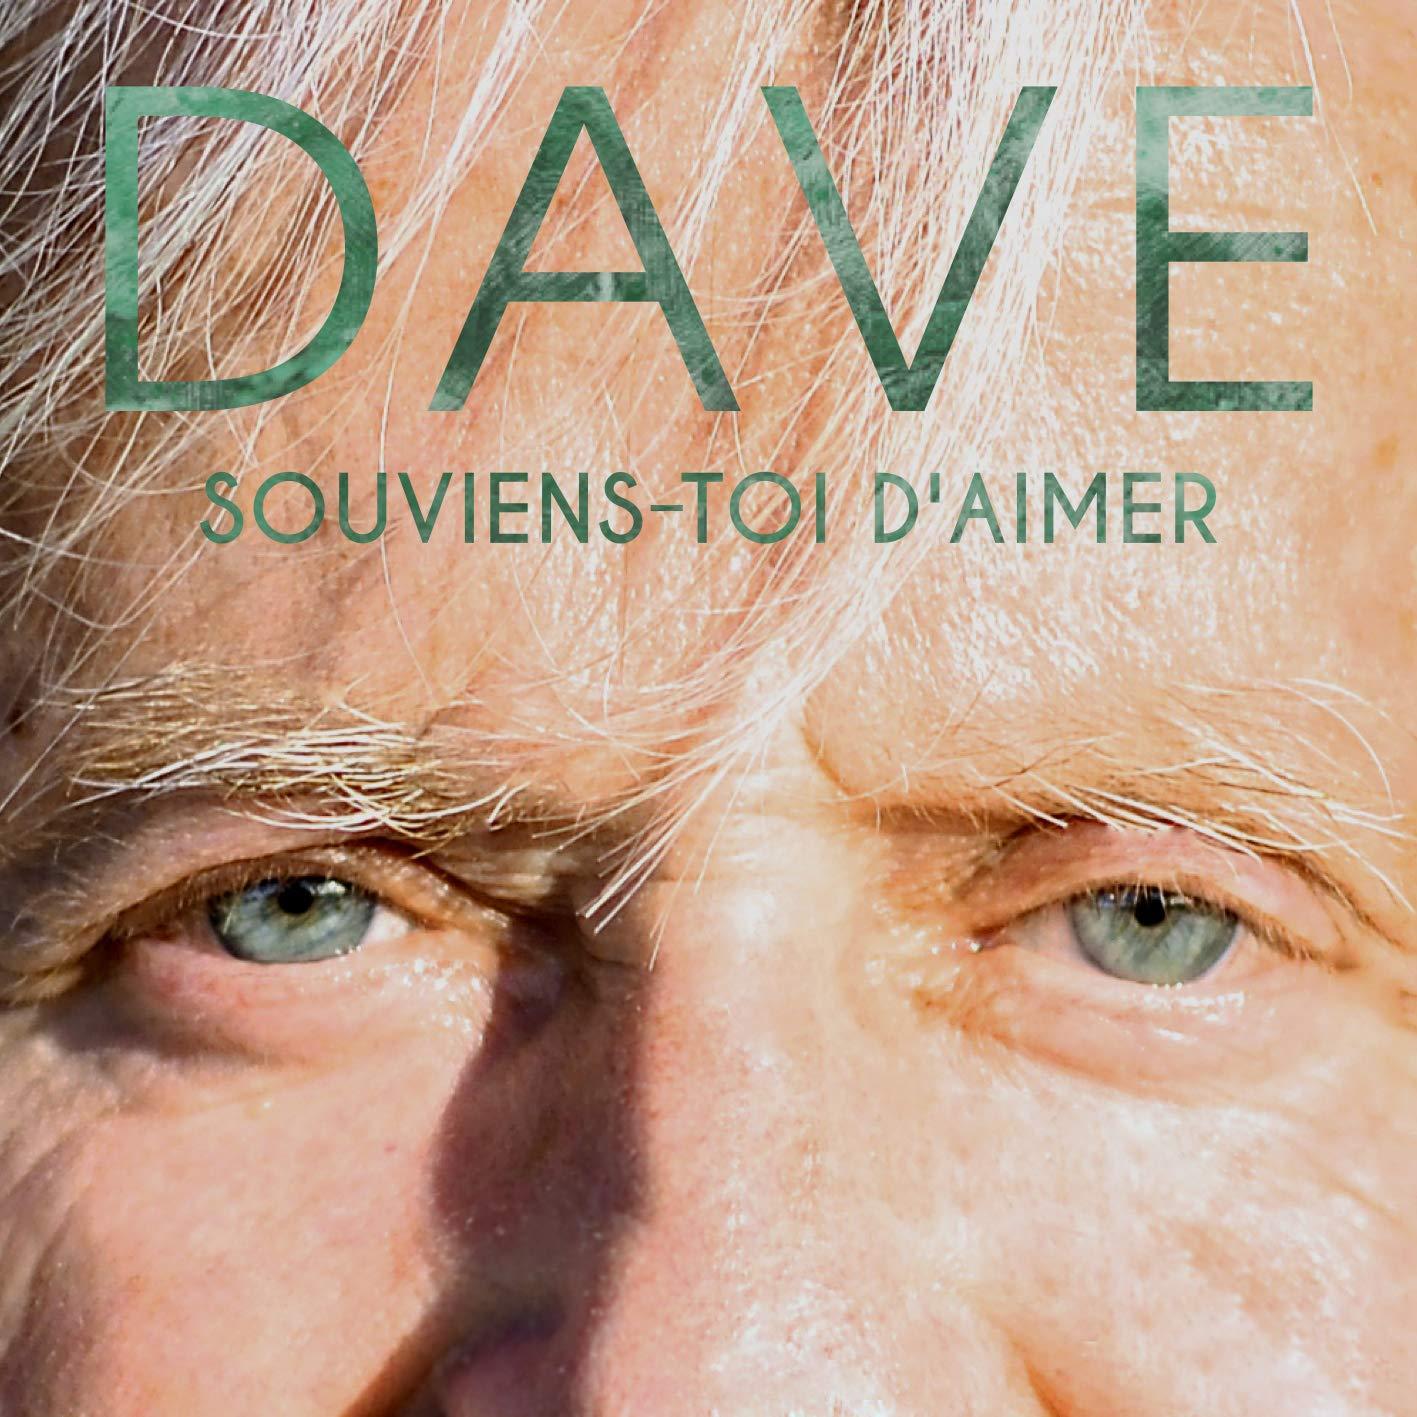 Dave 2019